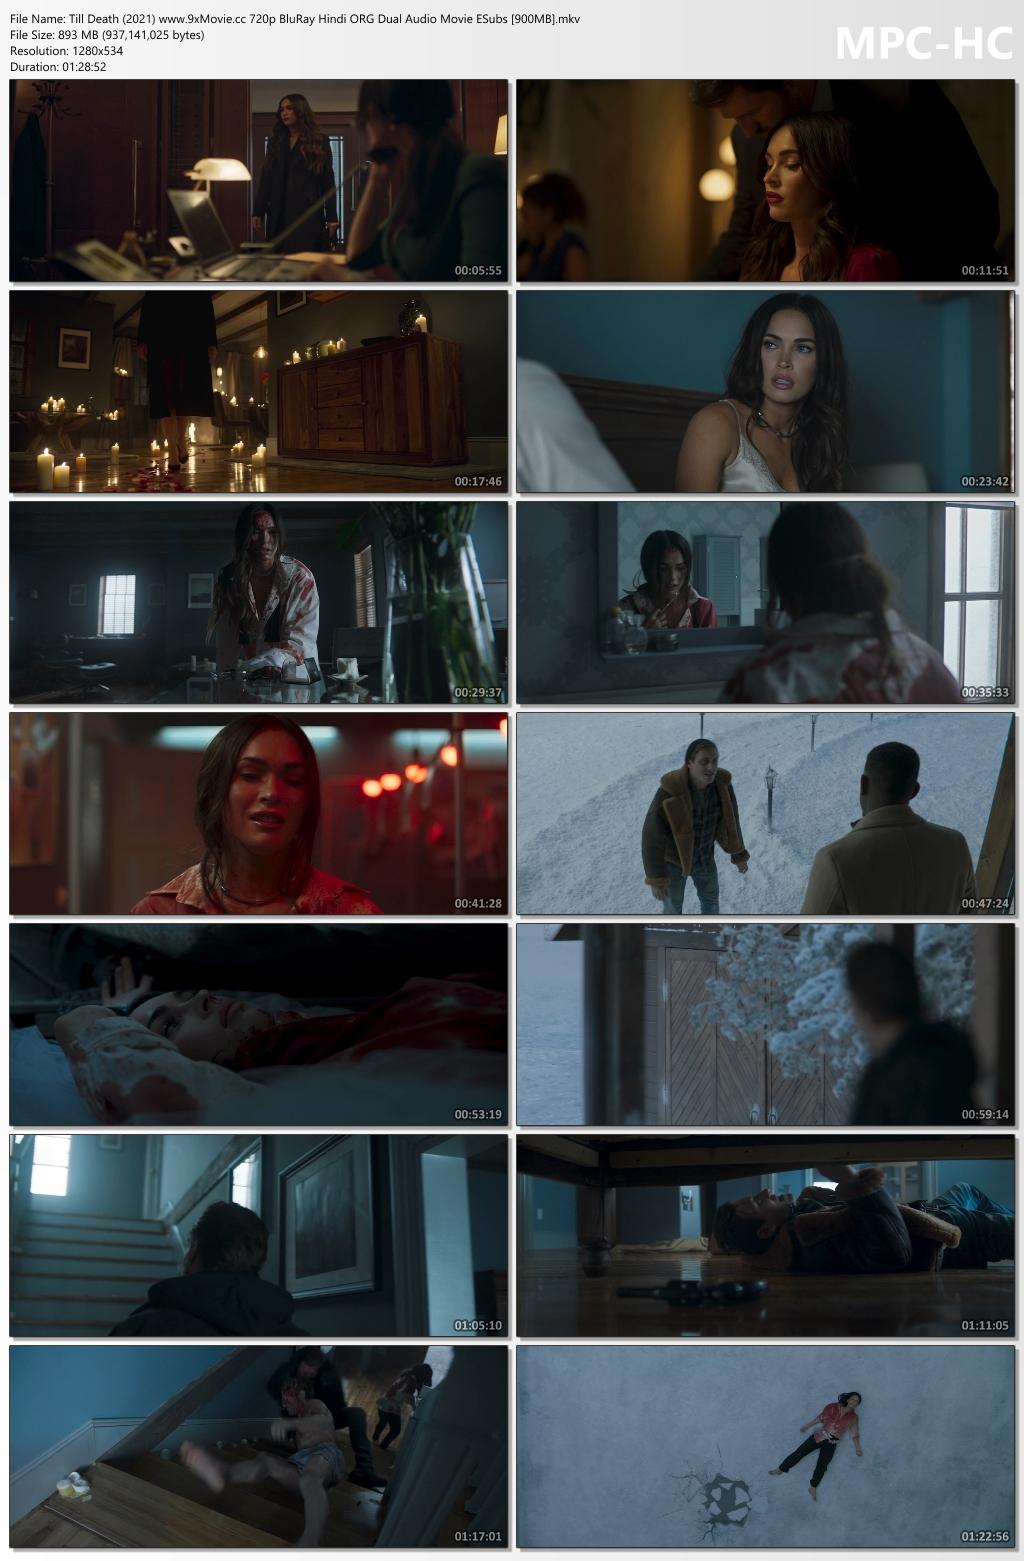 Till-Death-2021-www-9x-Movie-cc-720p-Blu-Ray-Hindi-ORG-Dual-Audio-Movie-ESubs-900-MB-mkv